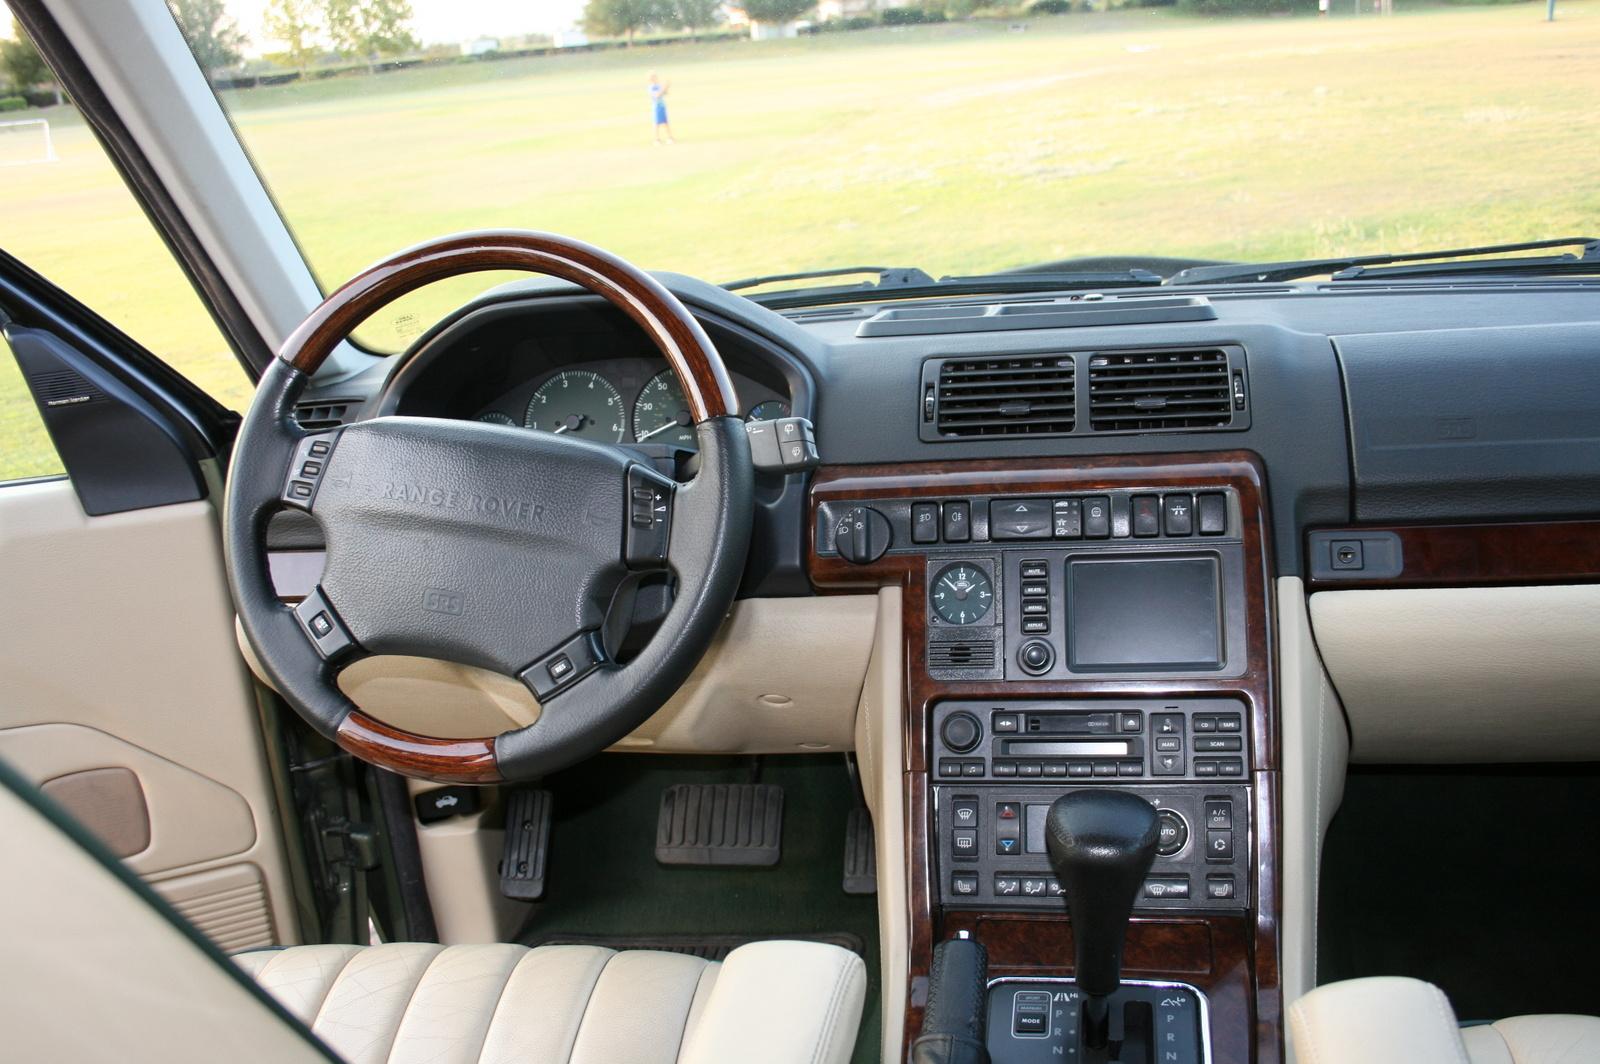 2001 Land Rover Range Rover Pictures Cargurus